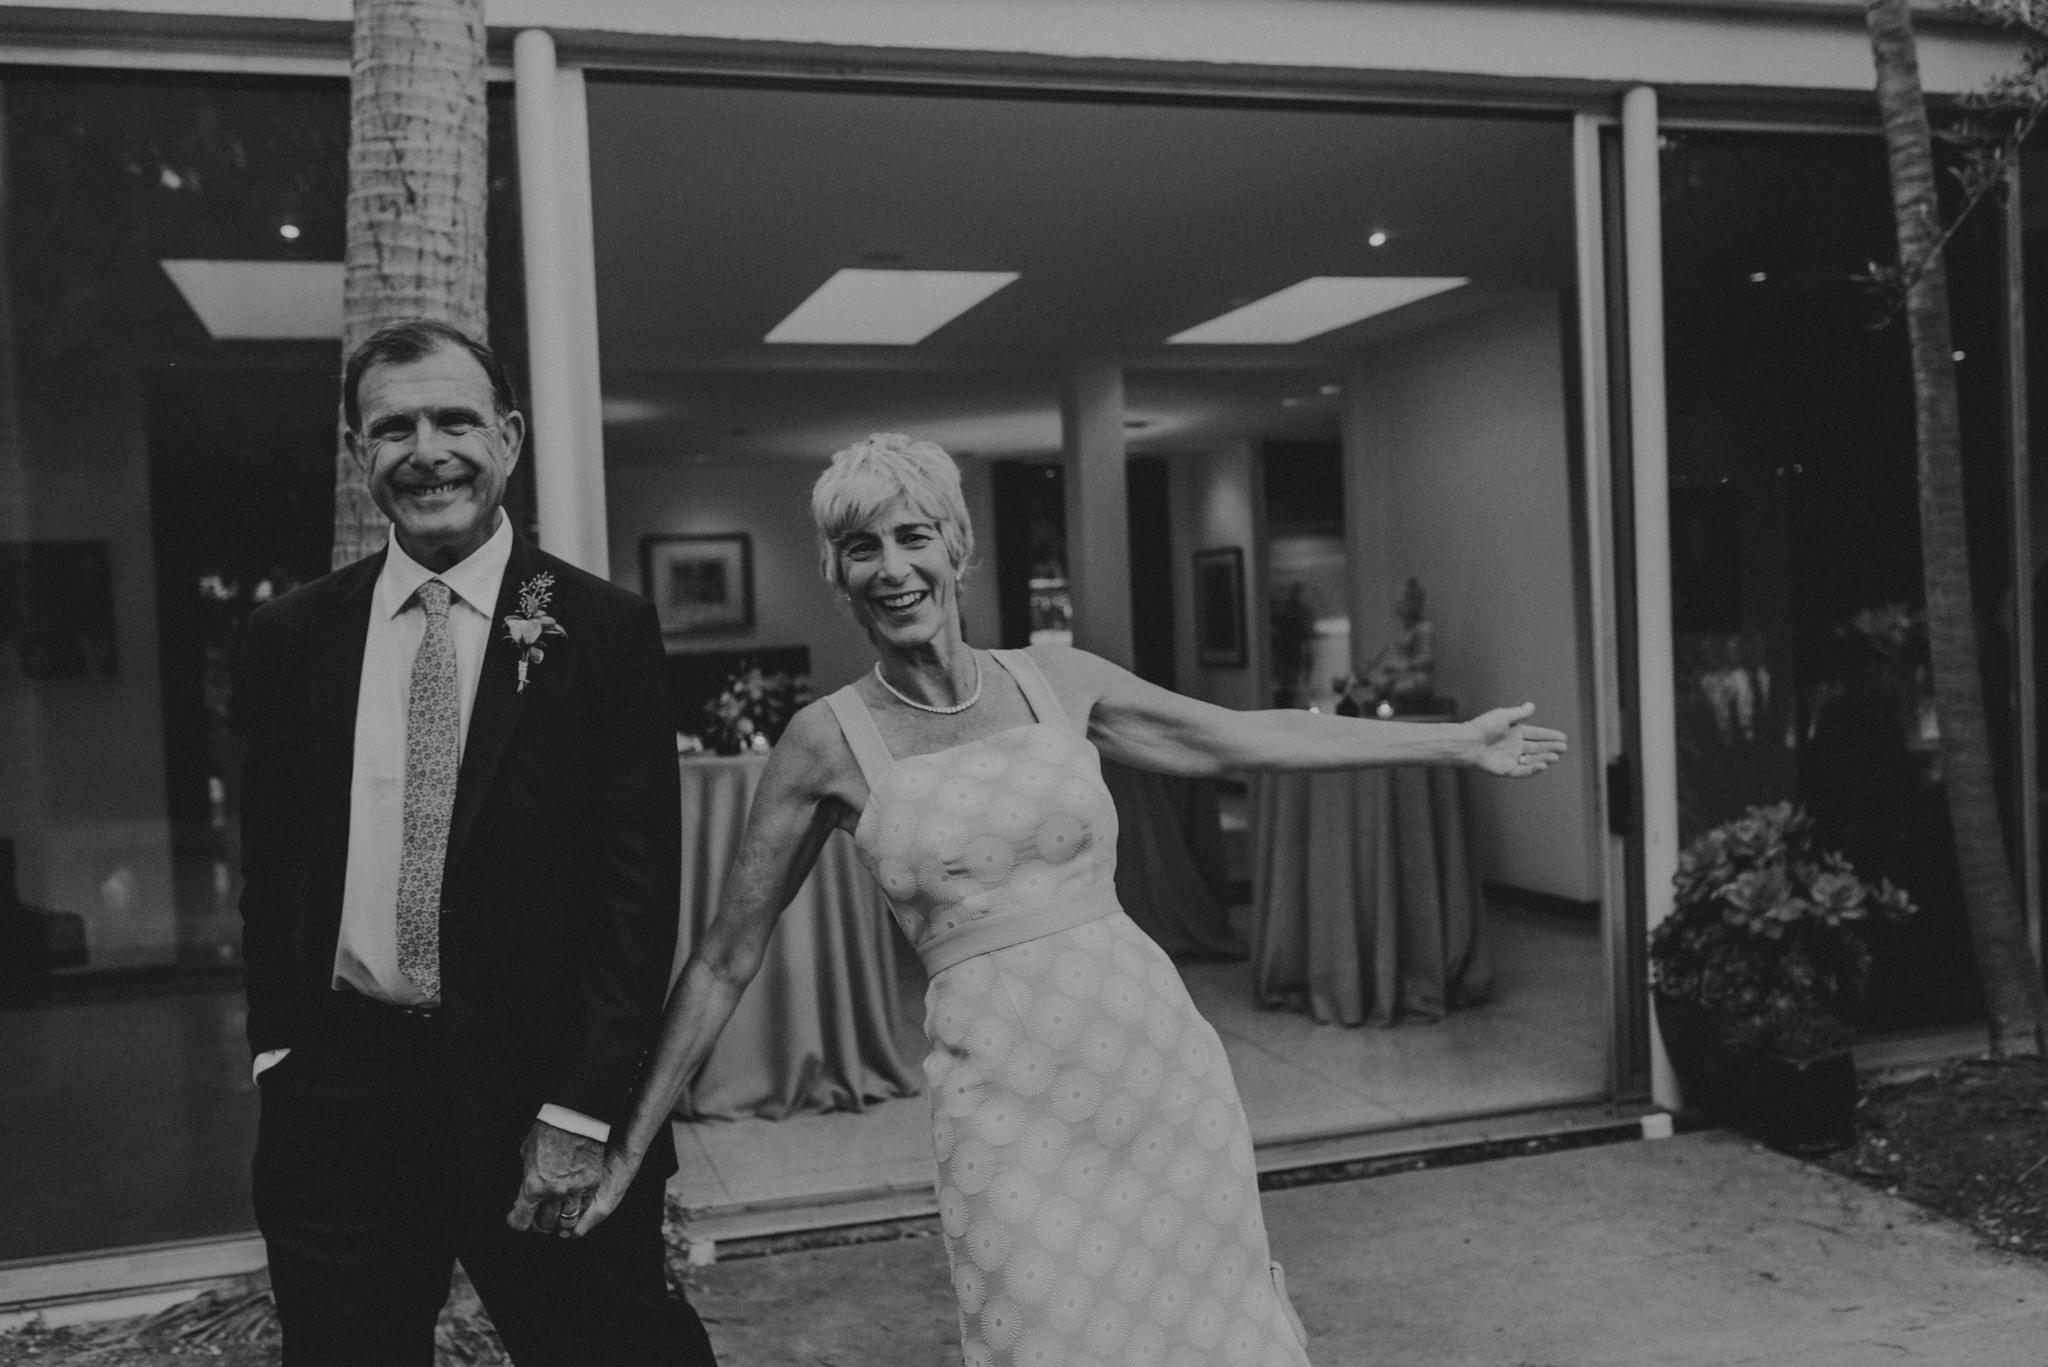 Isaiah + Taylor Photography - Private Estate Backyard Wedding - Beverly Hills - Los Angeles Wedding Photographer - 127.jpg